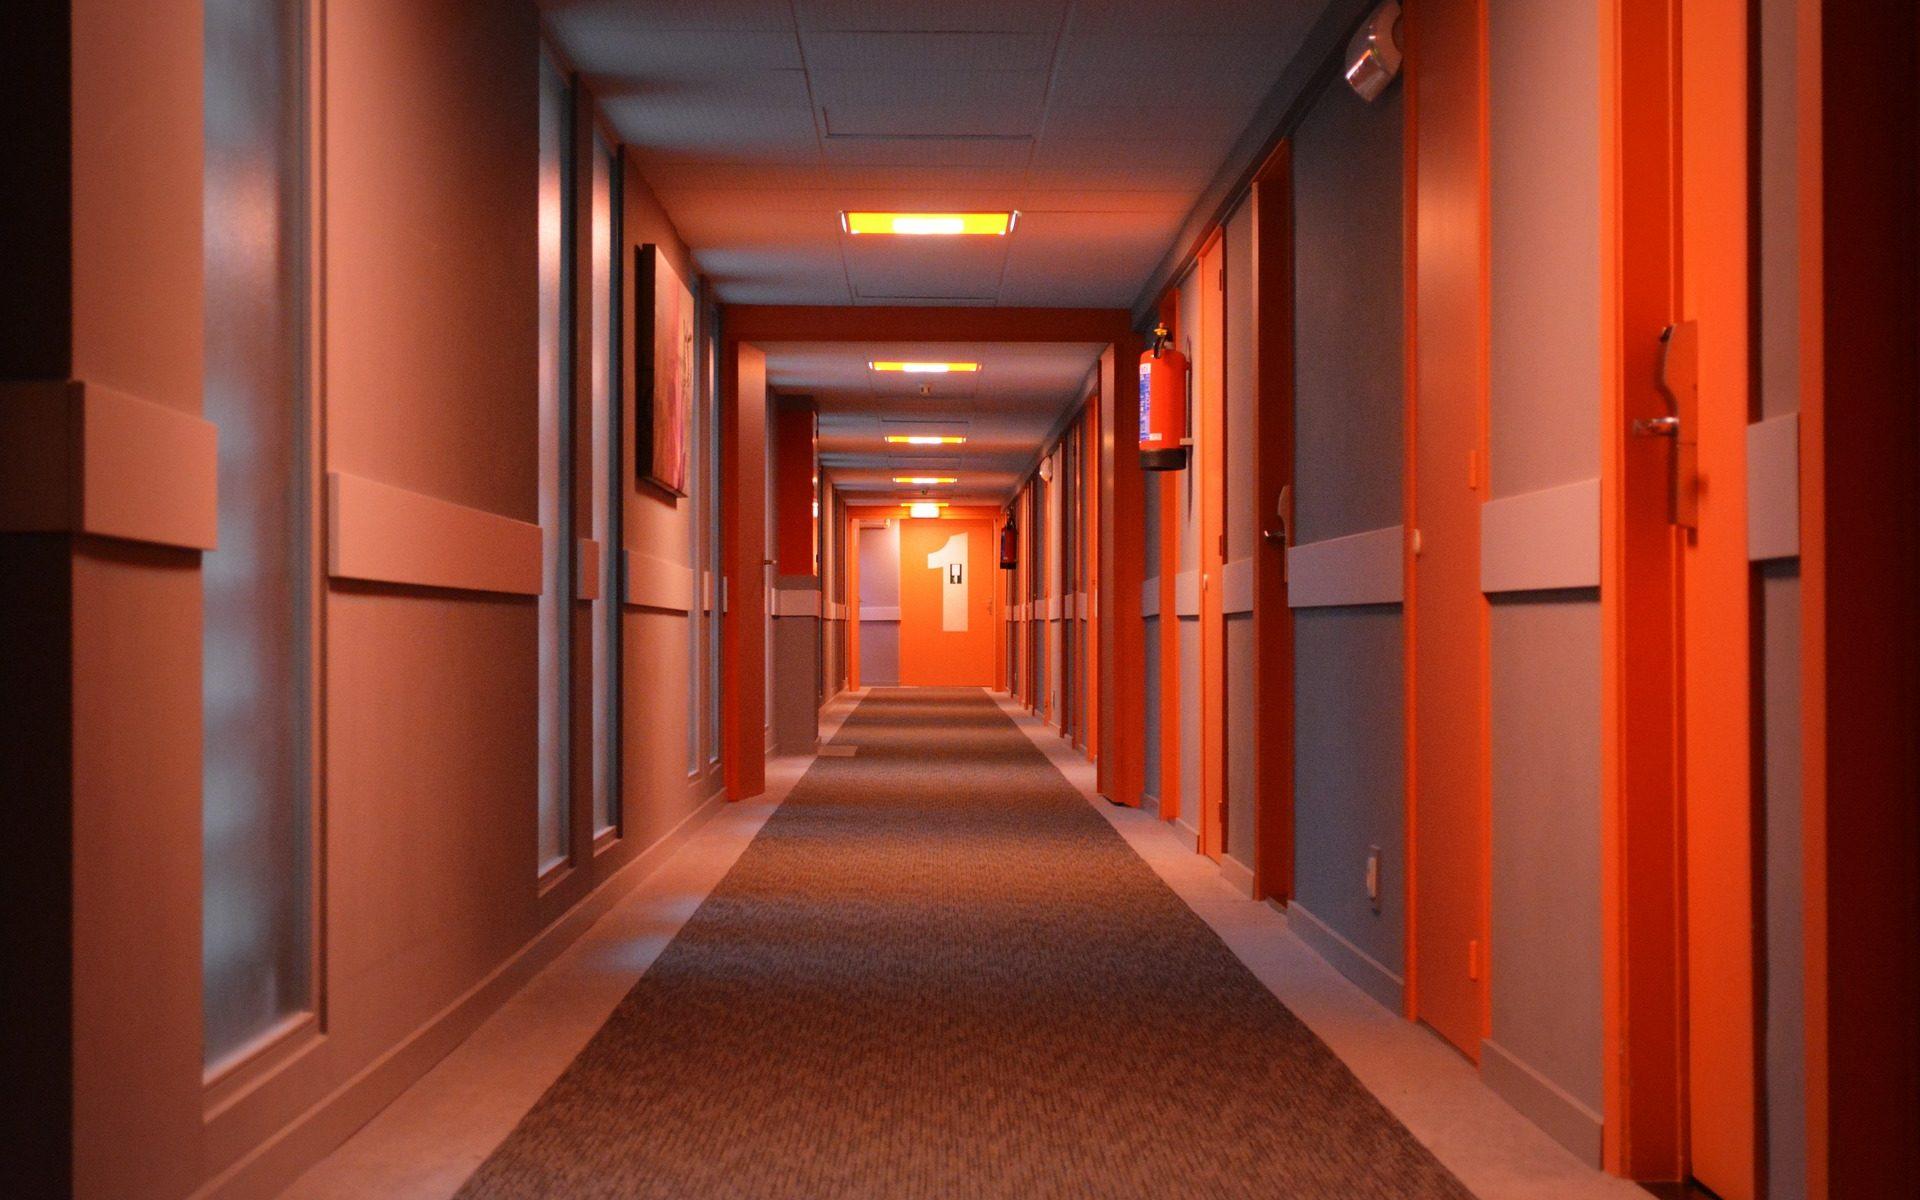 Hotel hallway 1st floor